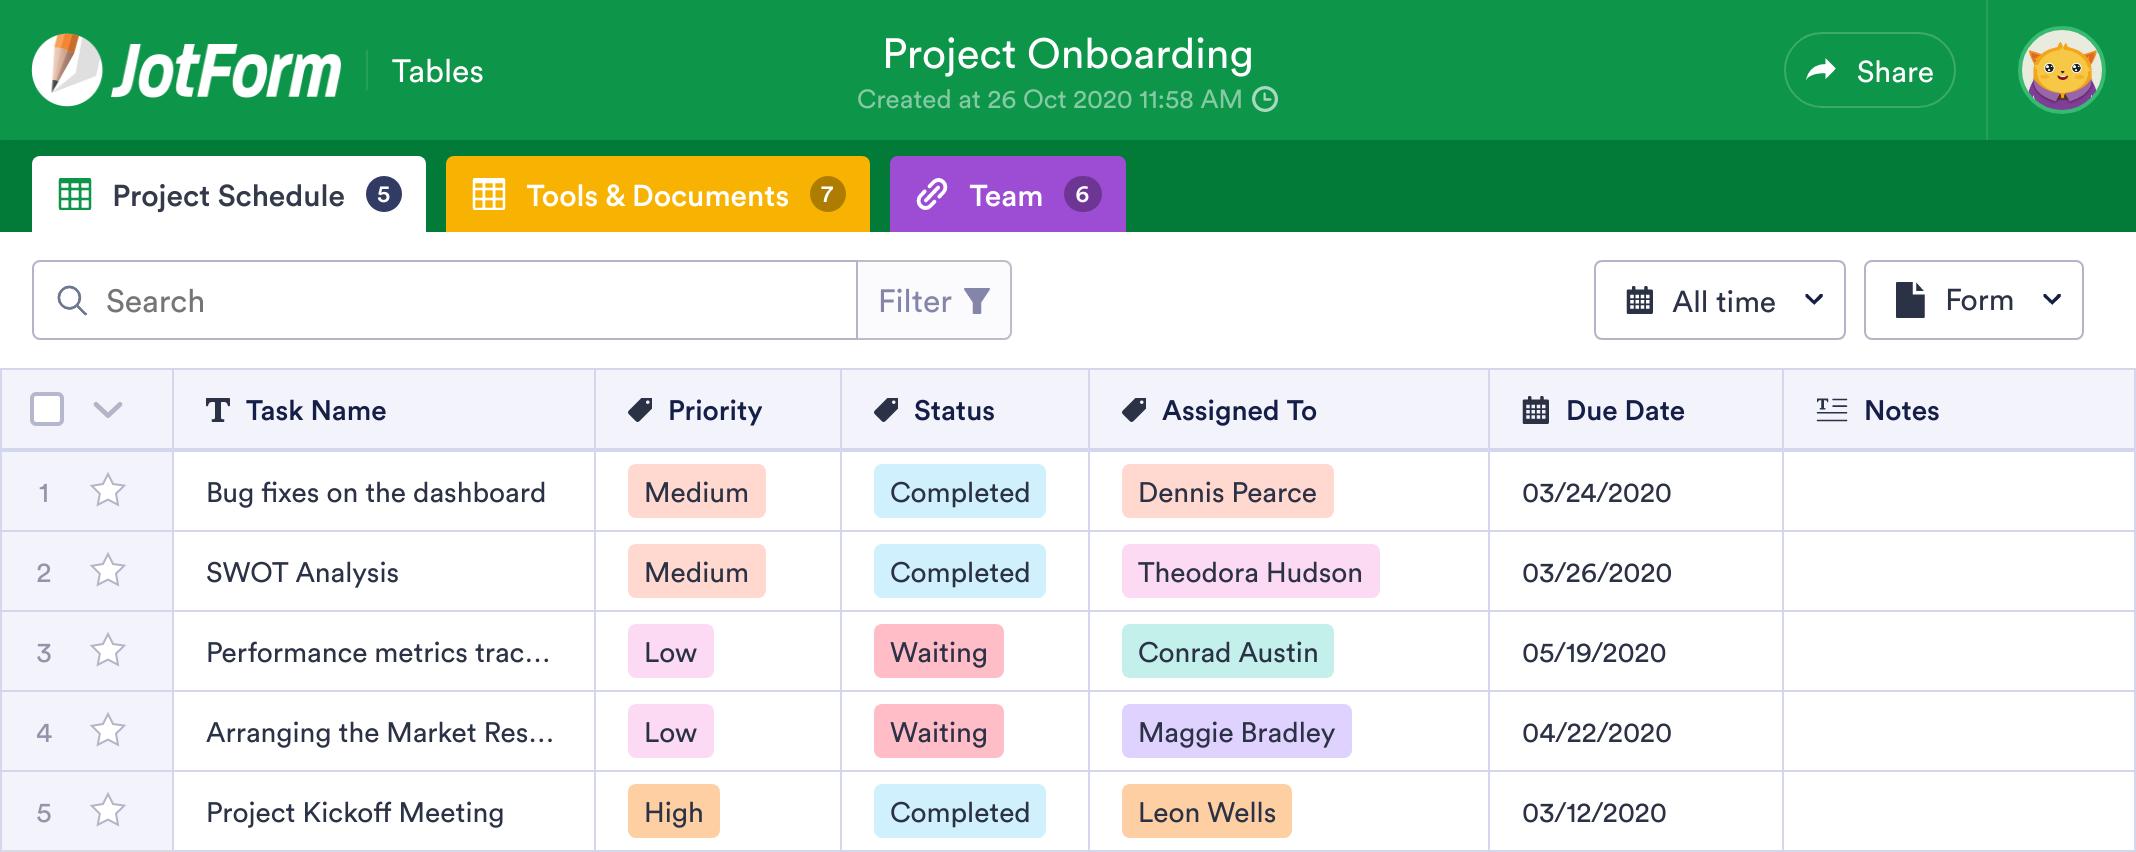 Project Onboarding